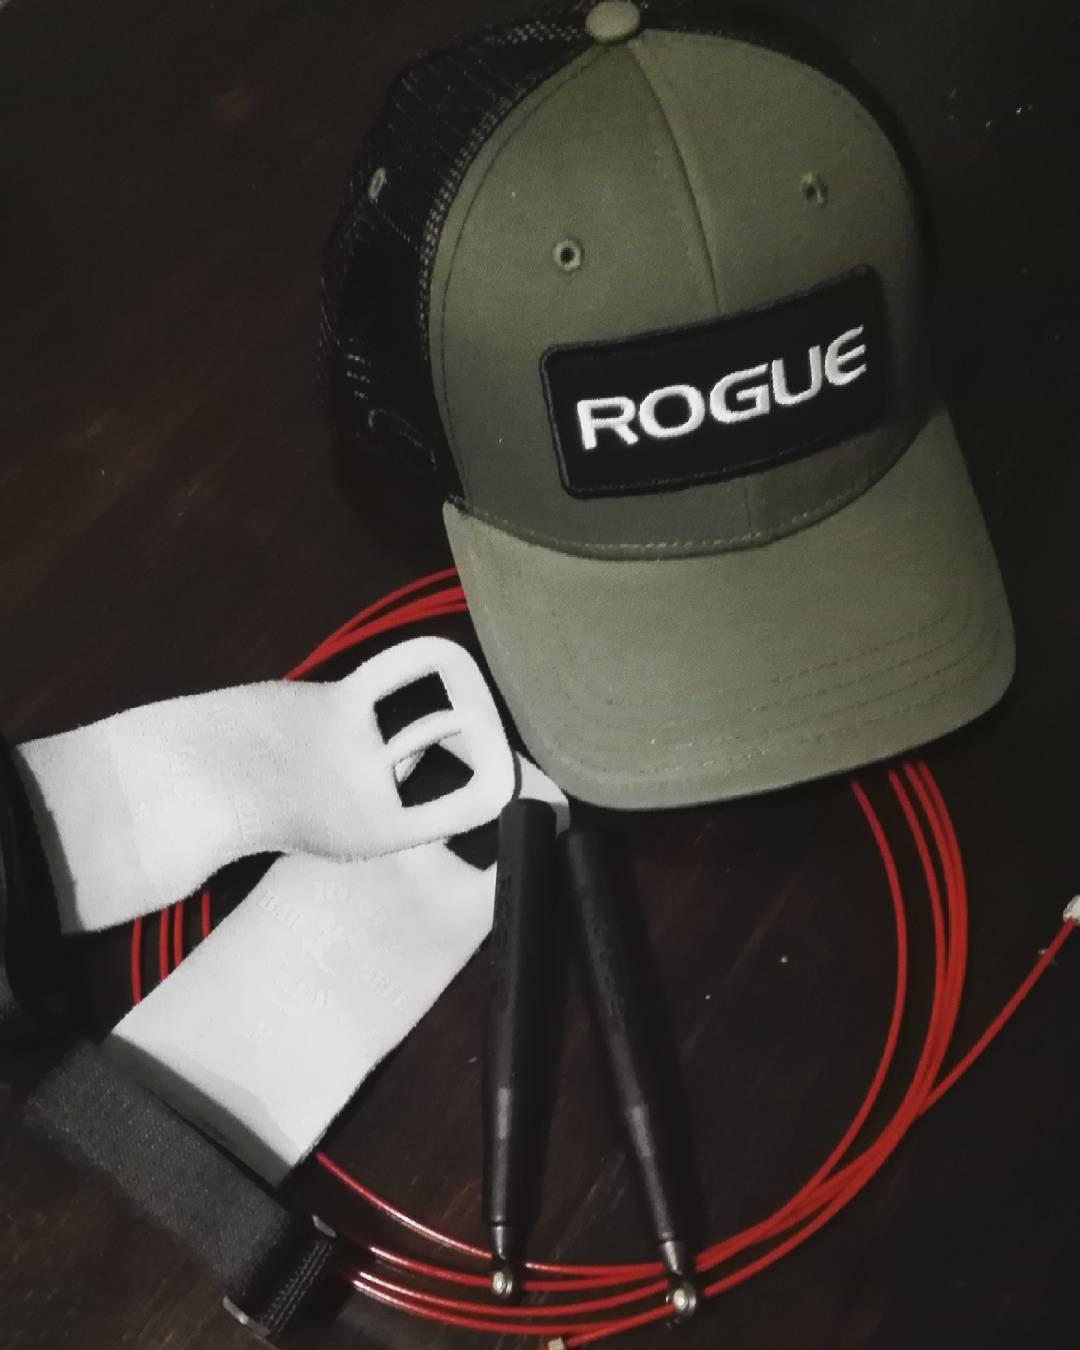 Rogue SR-1 Rogue Bearing Speed Rope